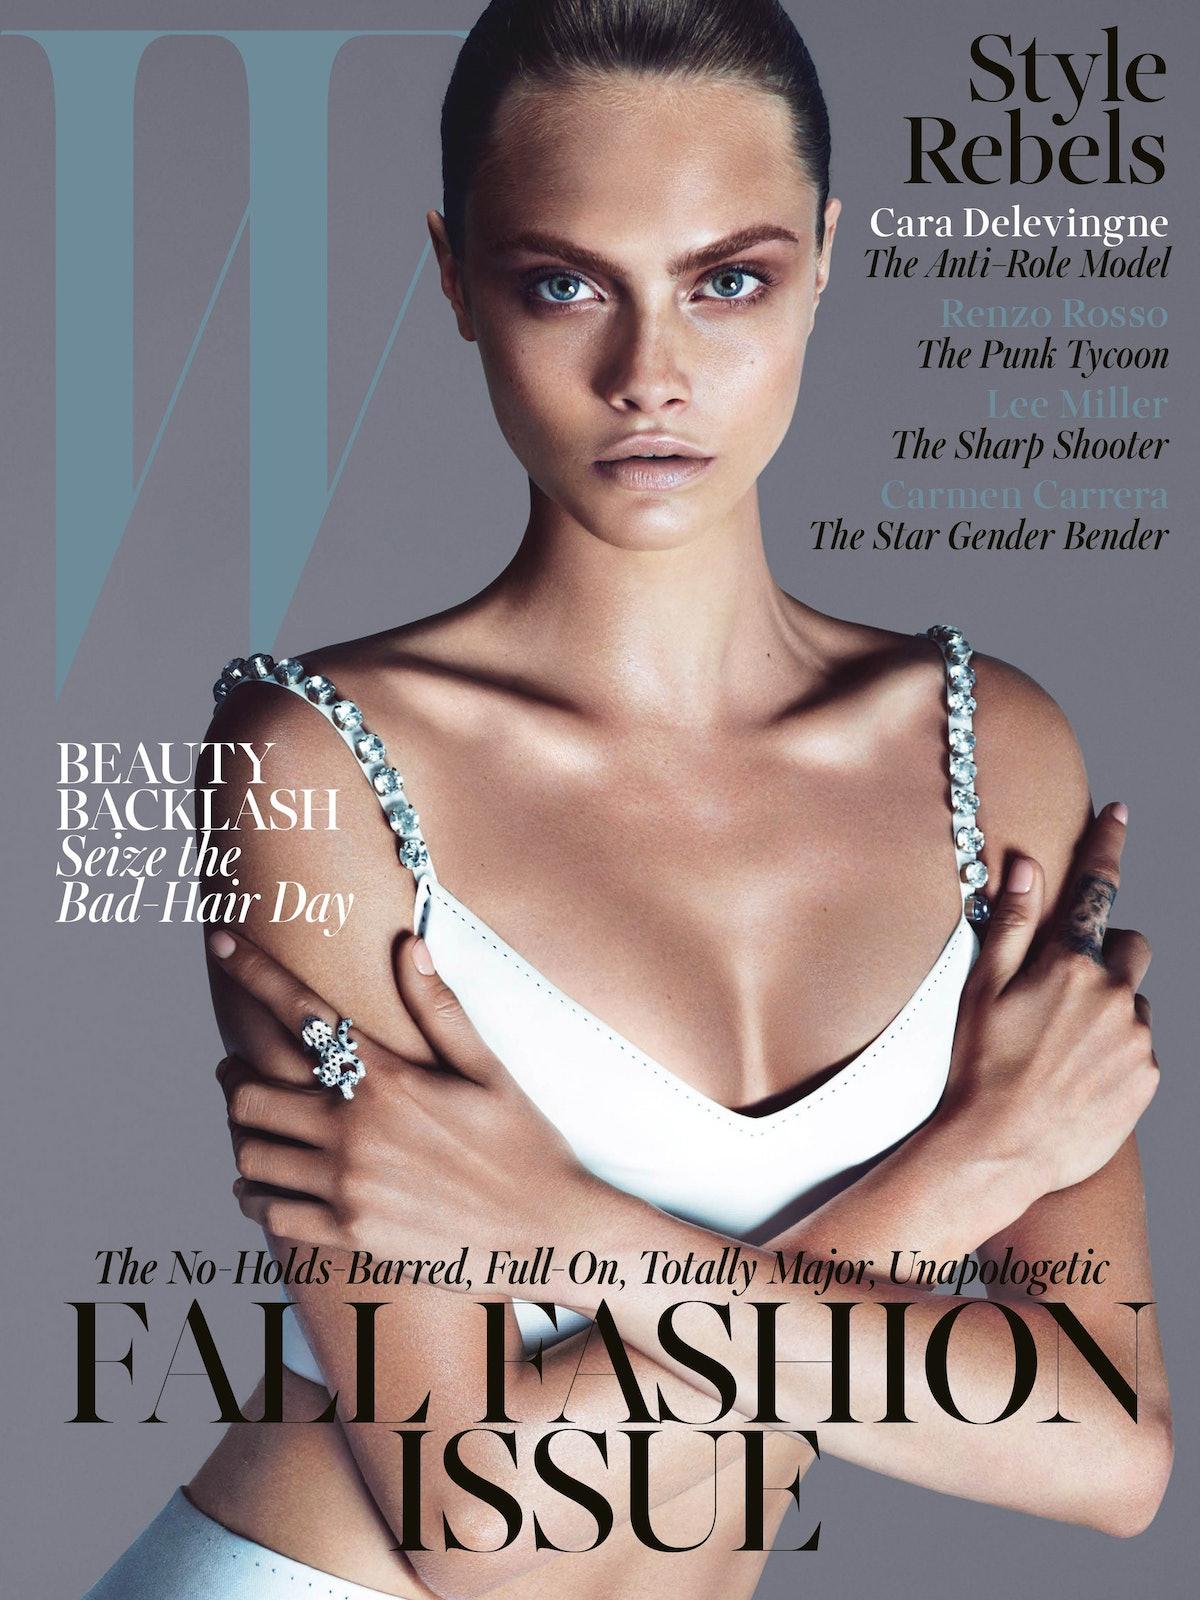 cear-cara-delevingne-model-cover-story-coverlines.jpg